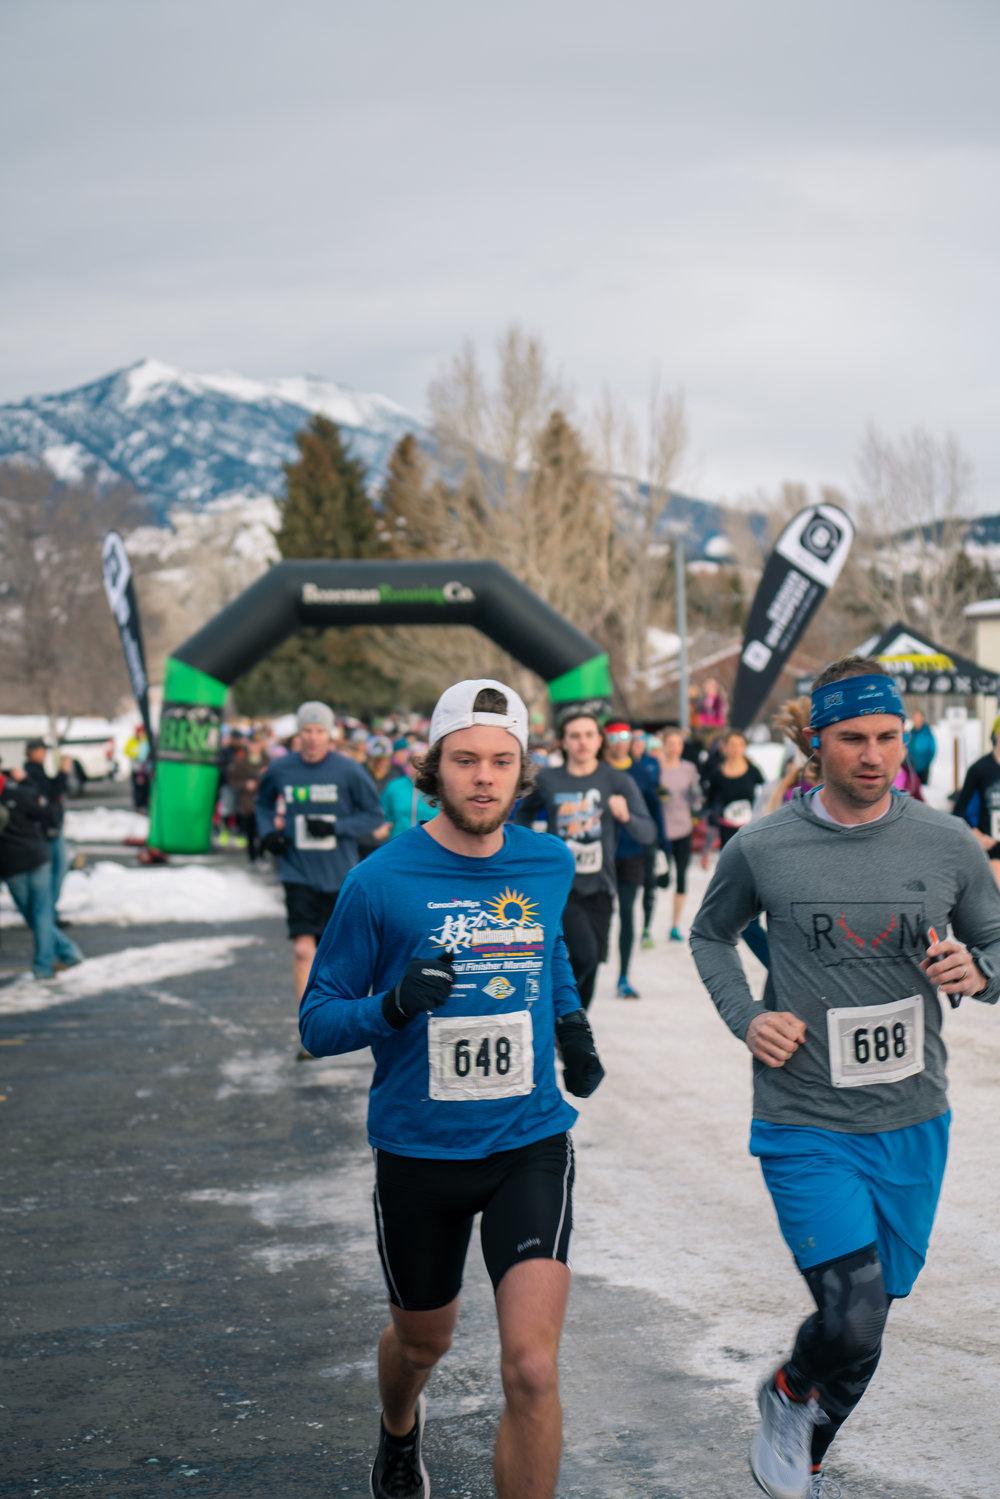 The start of Bozeman Running Co.'s racing of the Bear near Bozeman, Montana.